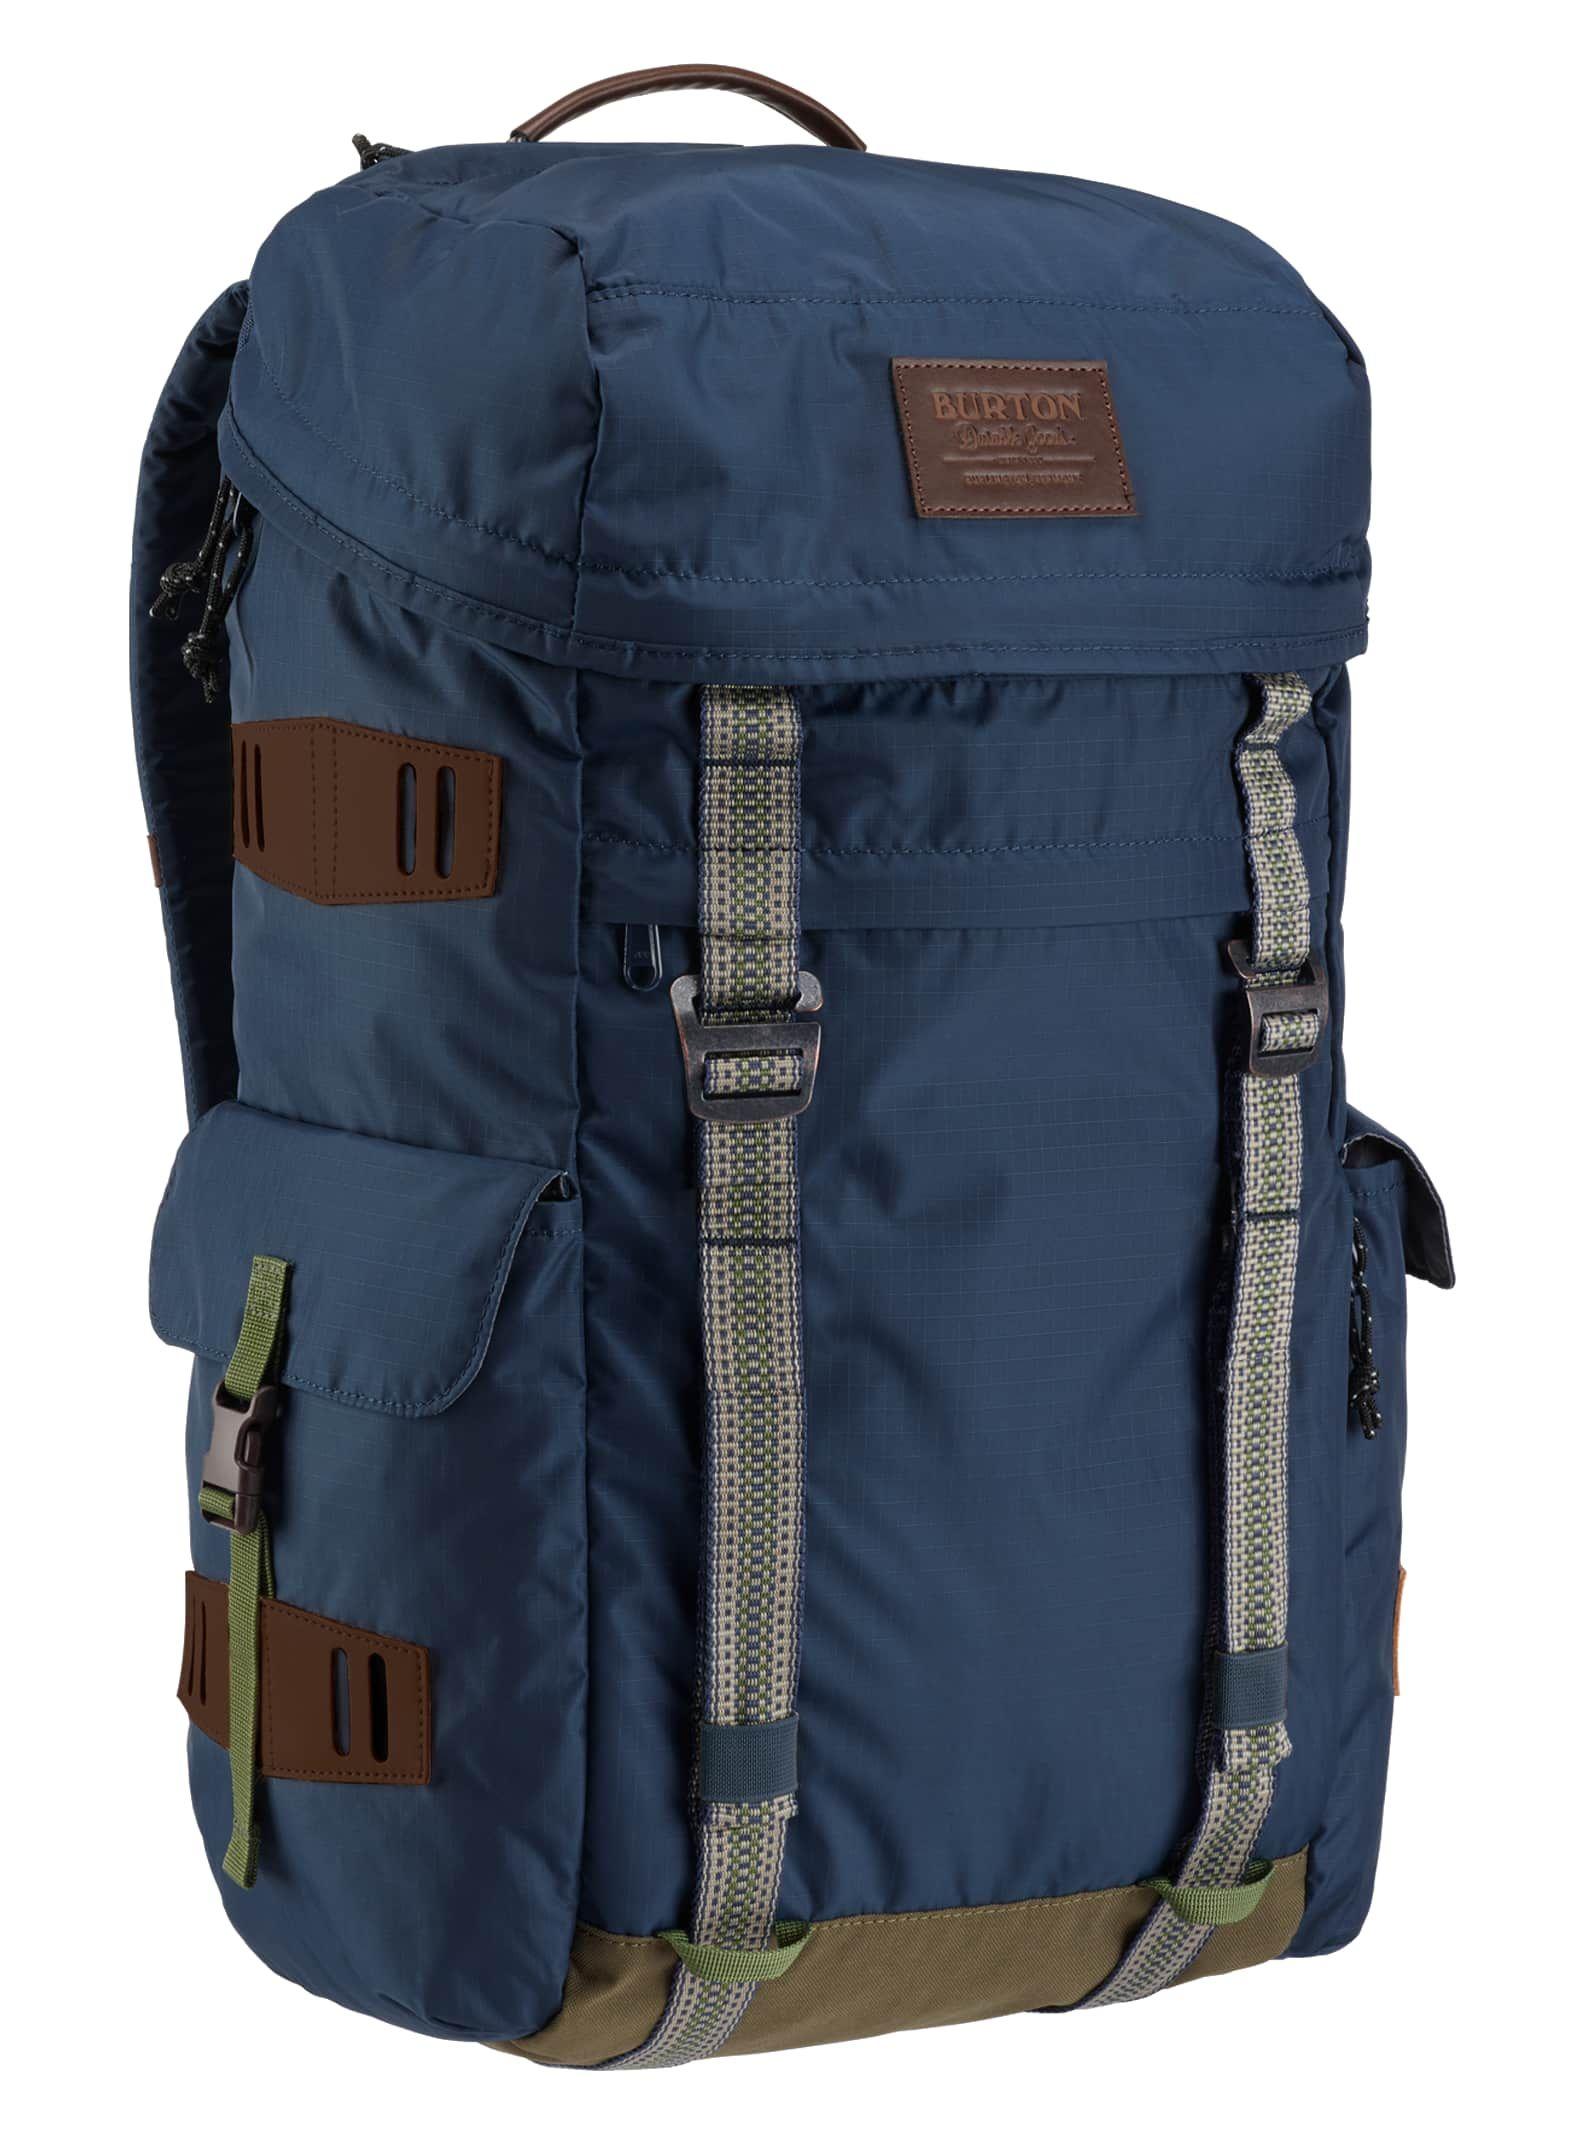 8c5cefd919 Burton Annex Backpack. Burton Annex Backpack Duffel Bag ...